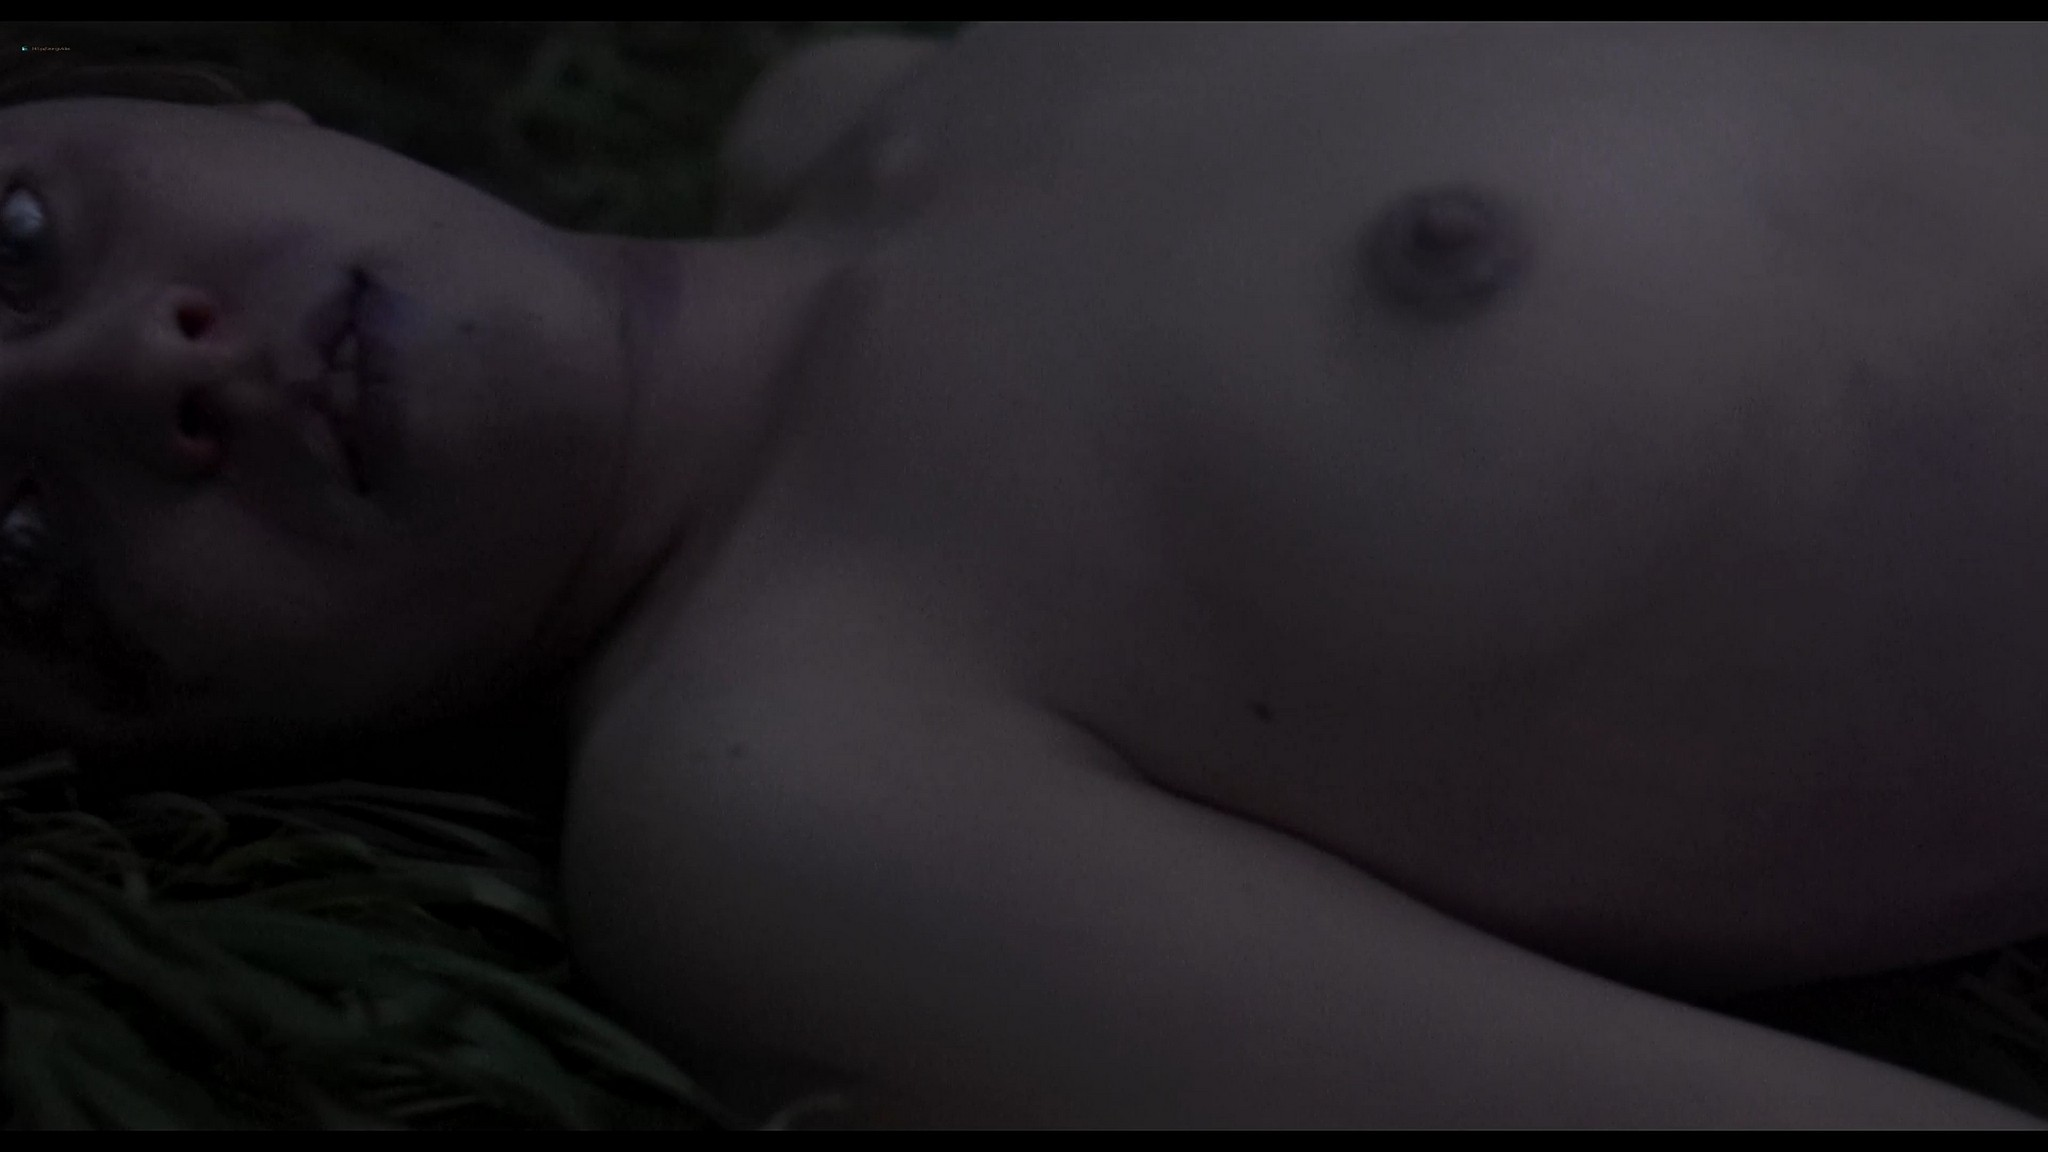 Danyi Deats nude bush topless but dead Rivers Edge 1986 HD 1080p BluRay 3